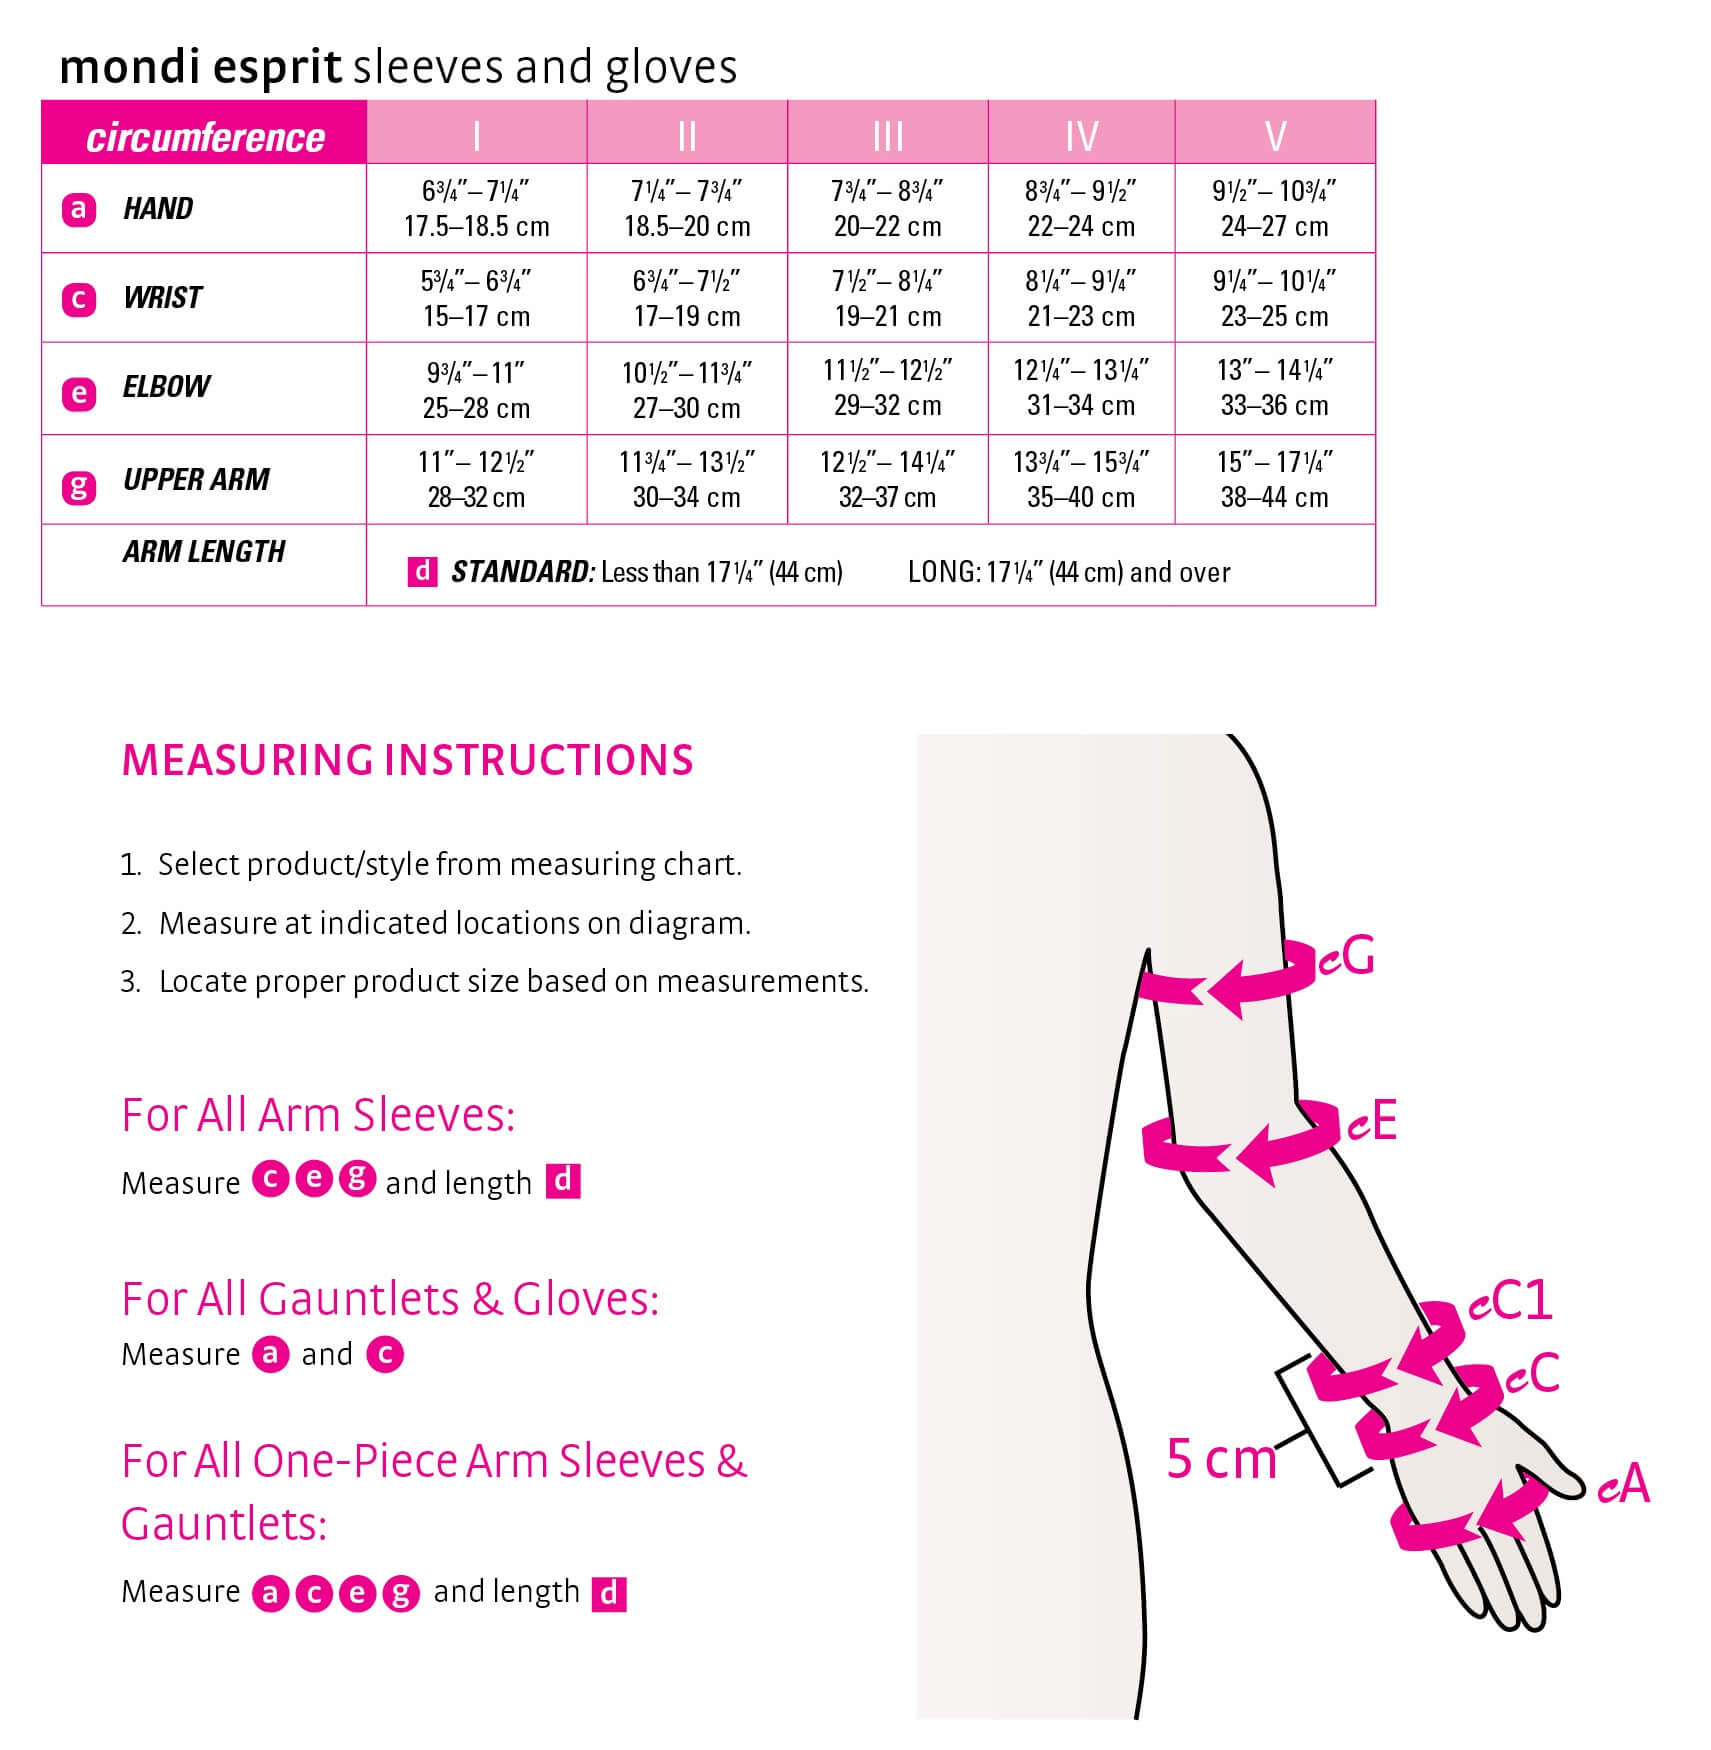 medi-esprit-size-chart-3.jpg